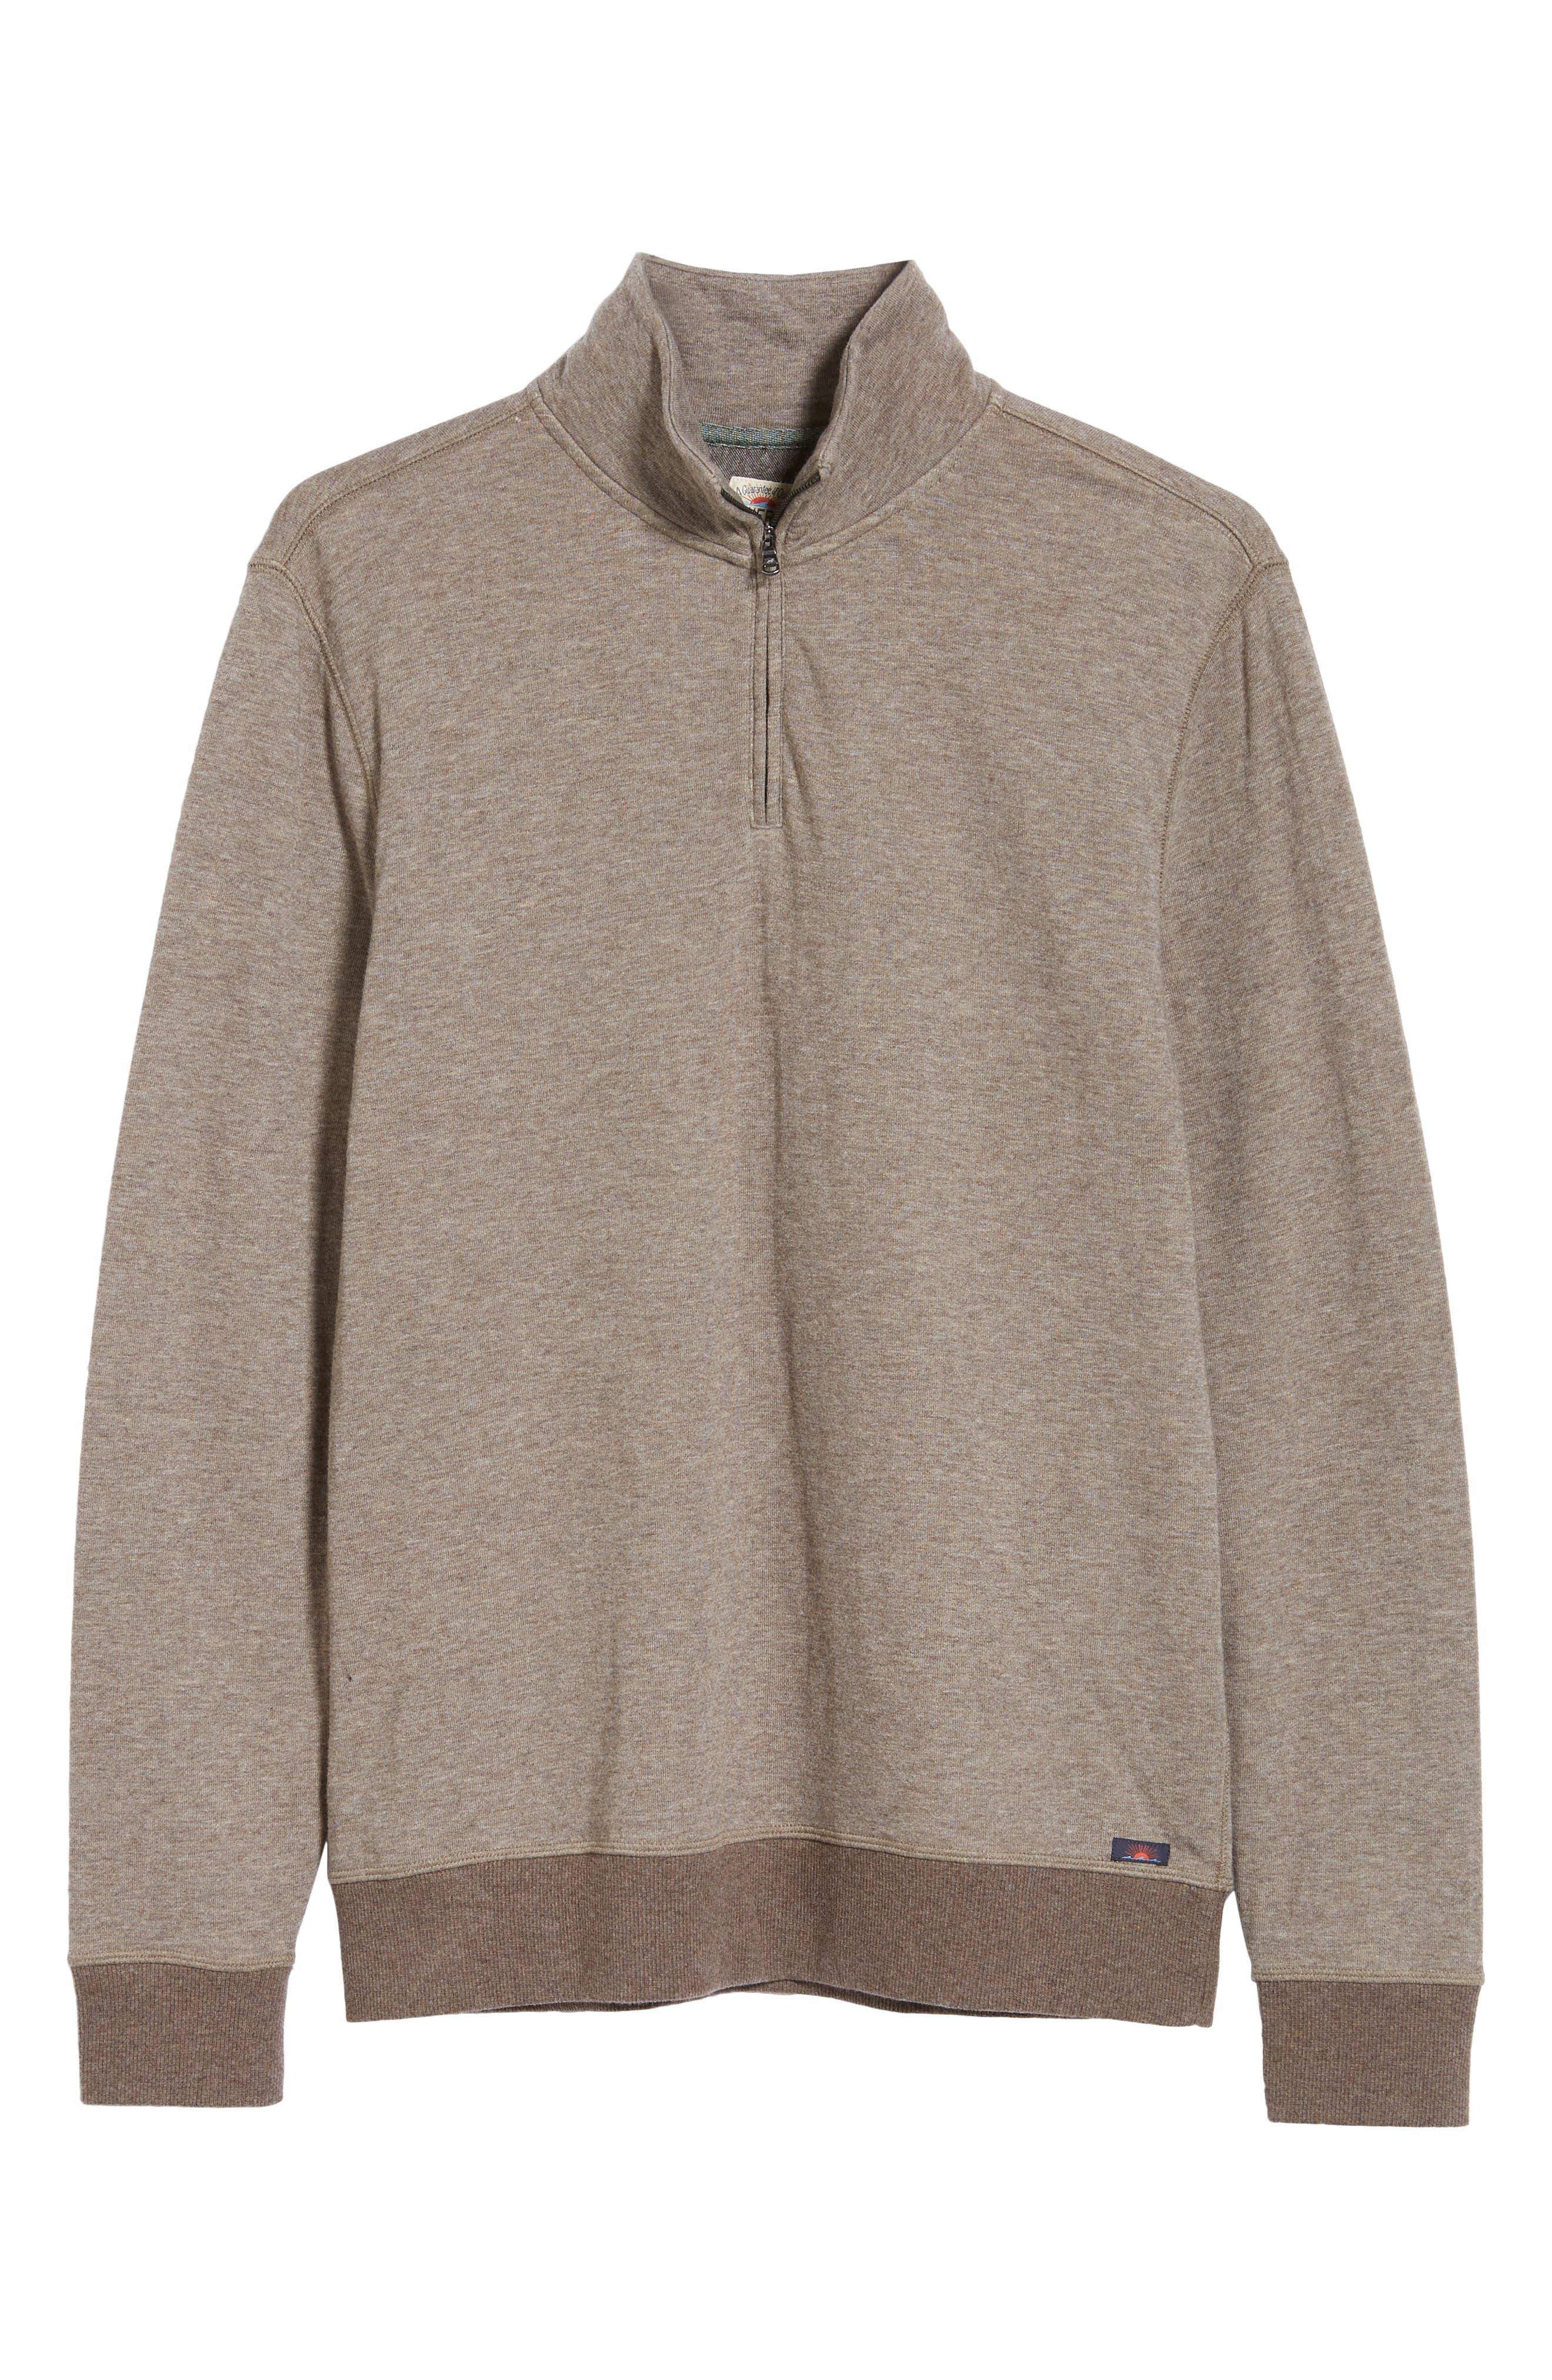 Dual Knit Regular Fit Quarter Zip Pullover,                             Alternate thumbnail 6, color,                             CHESTNUT